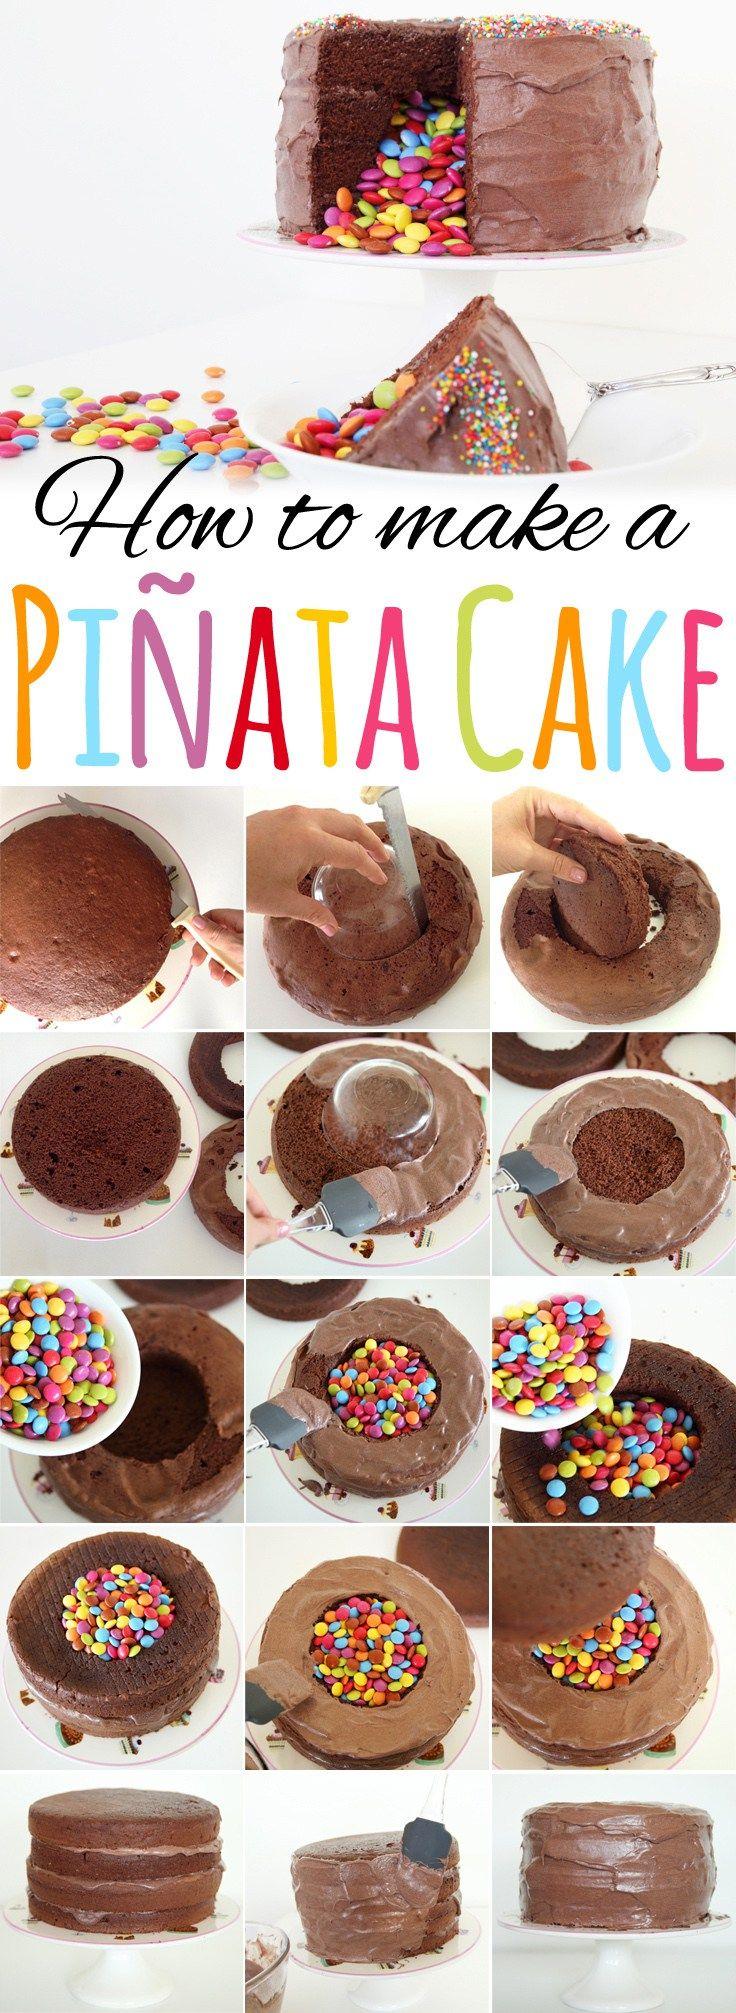 Enjoyable Birthday Cakes How To Make A Pinata Cake Yesbirthday Home Of Funny Birthday Cards Online Ioscodamsfinfo